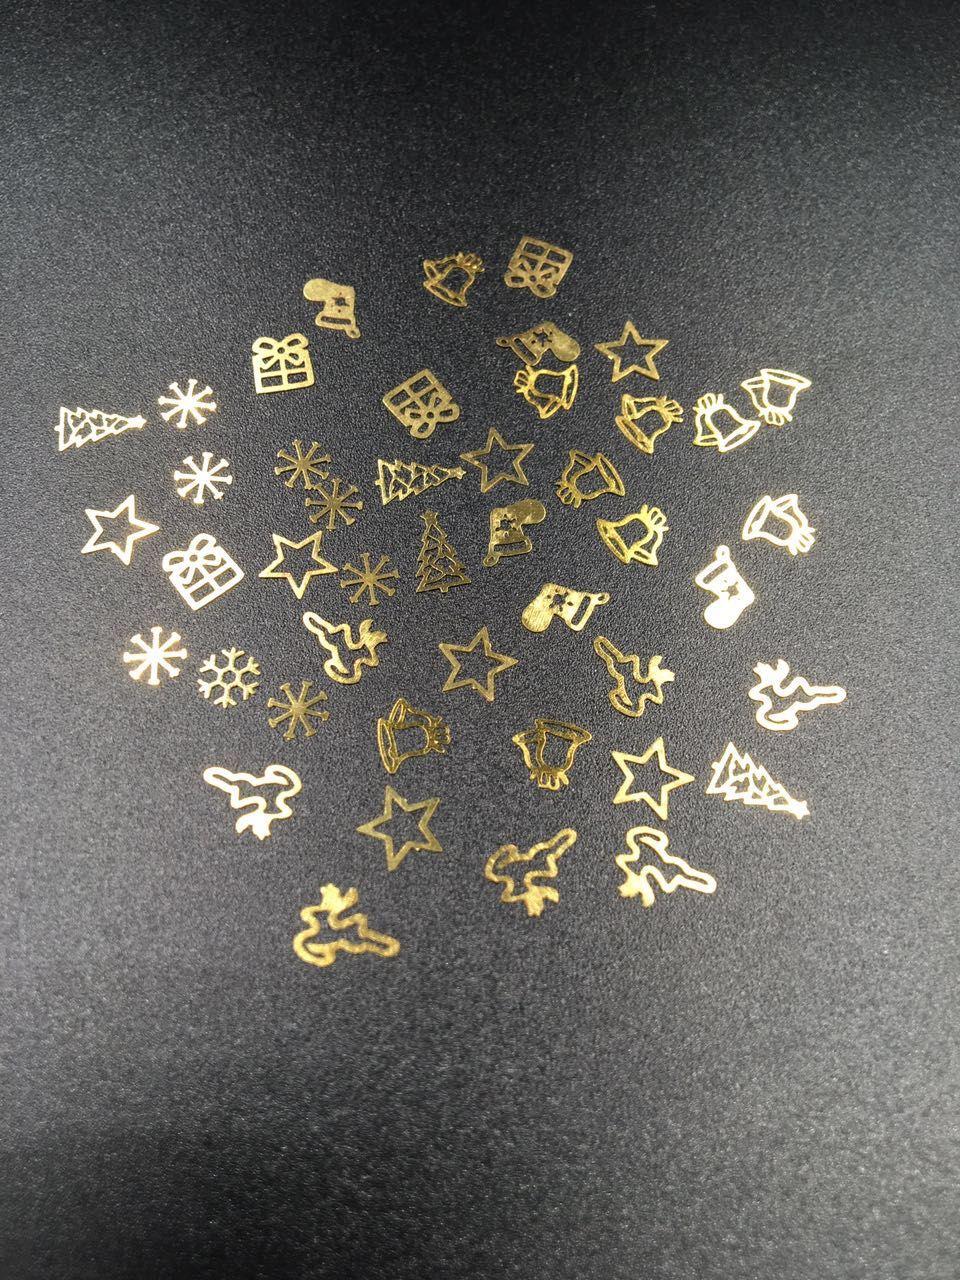 Fashion 3D Tips Metal Sticker DIY Wheel Boots Christmas Tree Jewelry Nail Art Xmas Decoration Design Wheel Christmas Gift